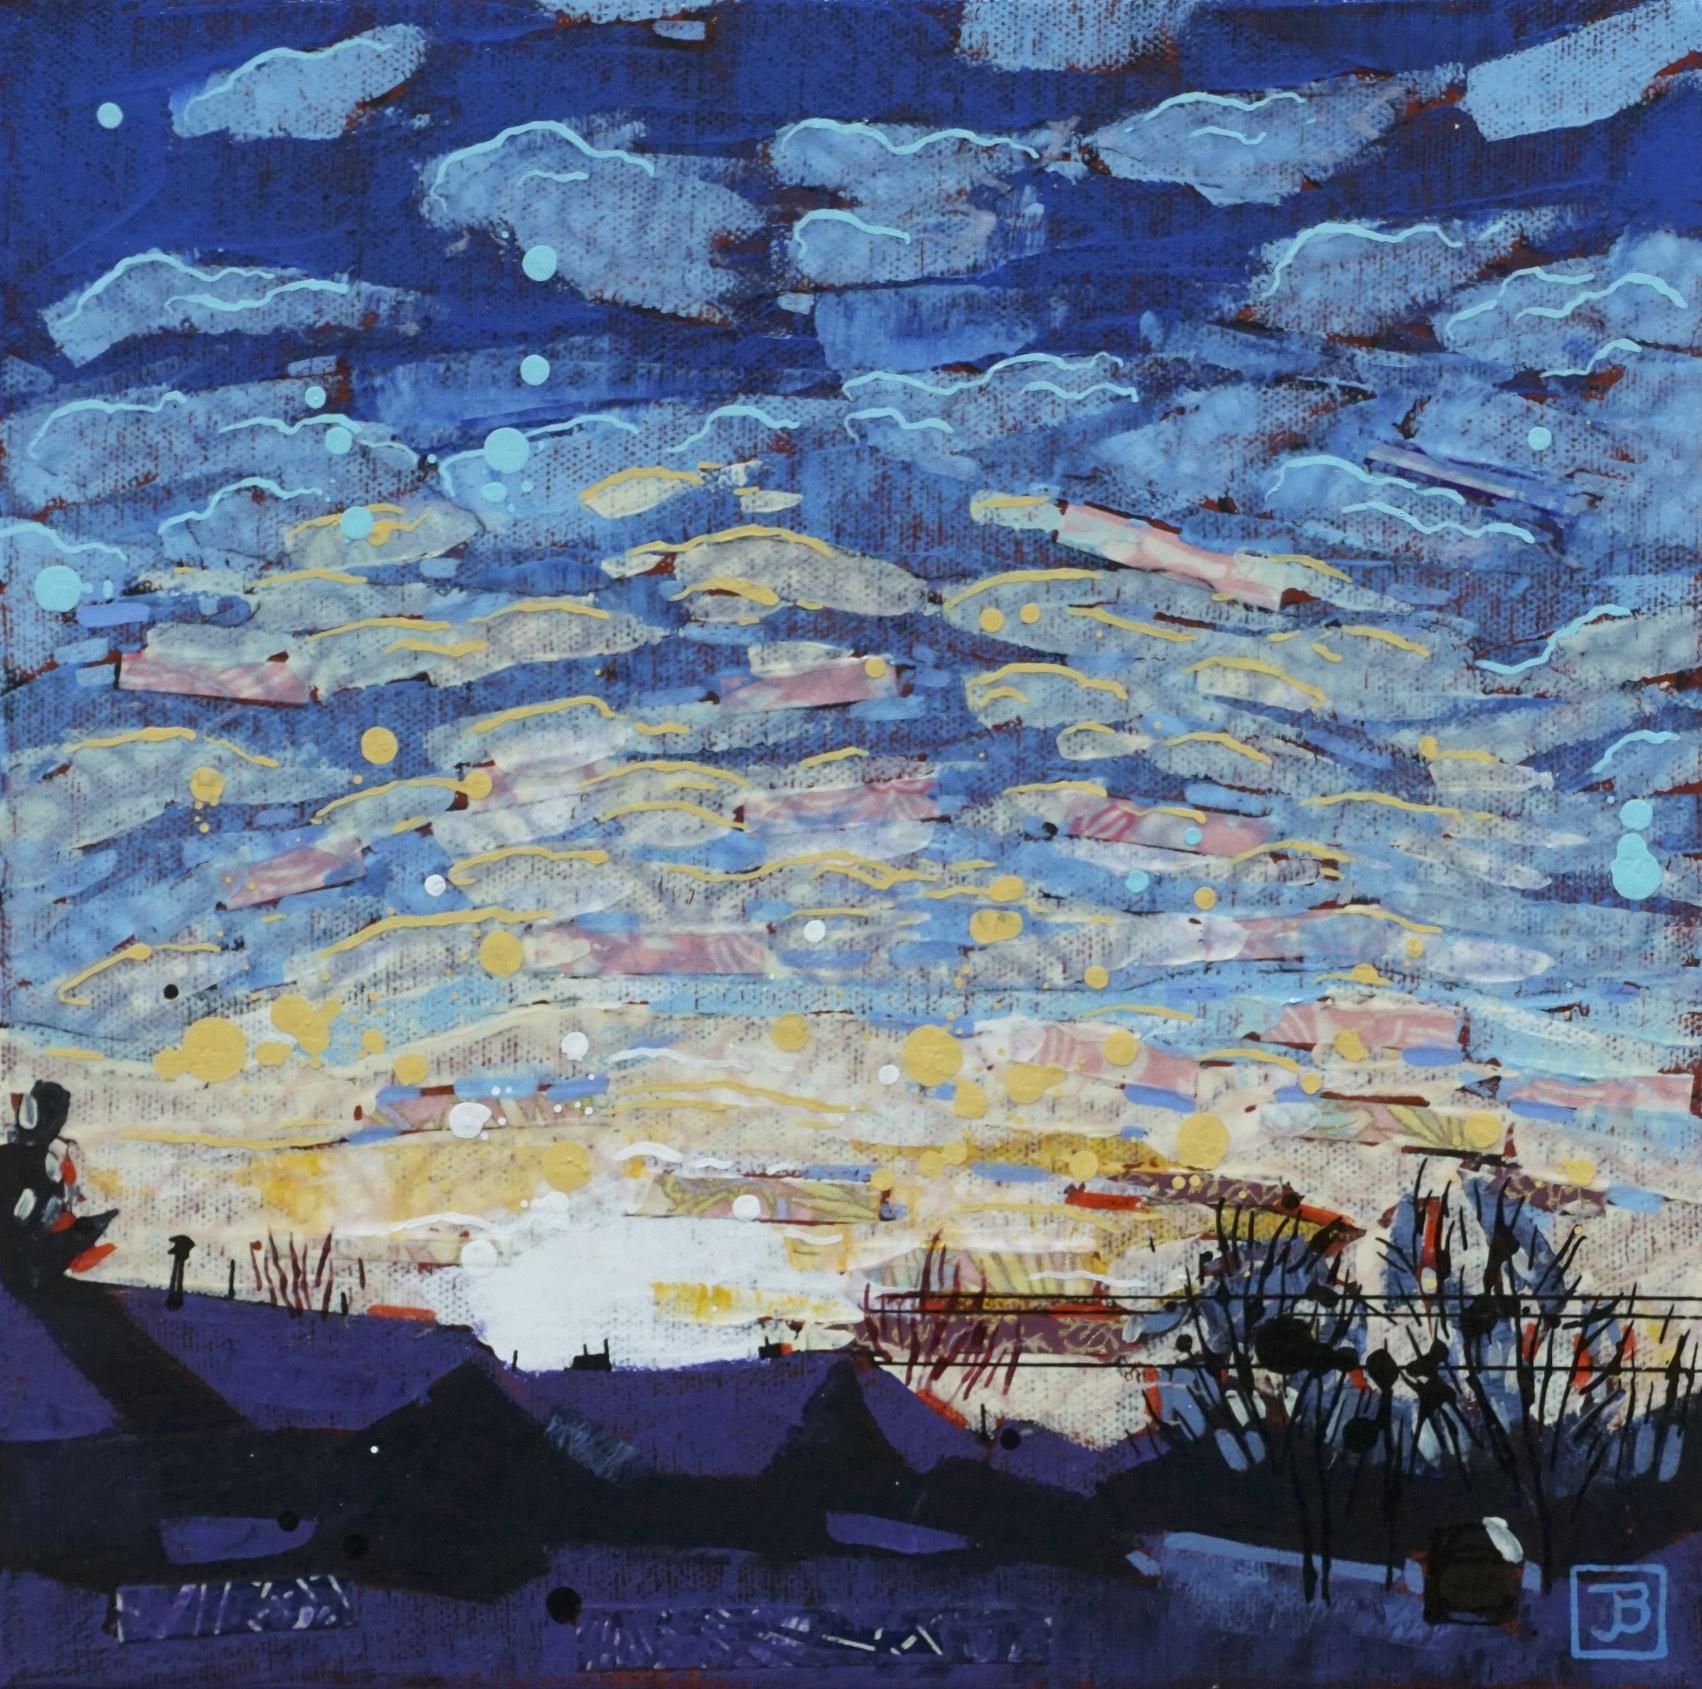 "mackerel sky, winter,  mixed media on canvas, 10"" x 10"", $200 + GST,  2019"